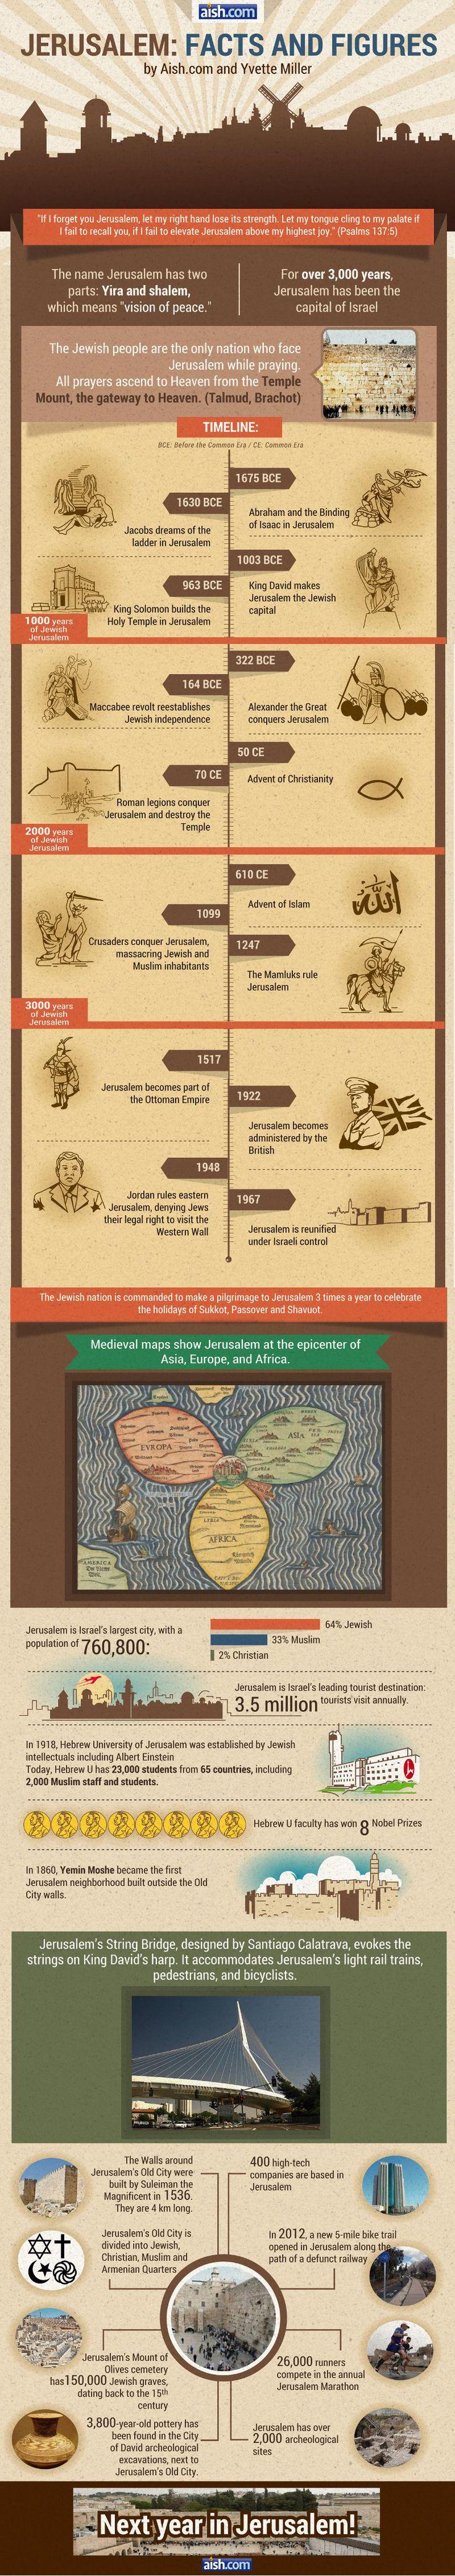 #Jerusalem: Facts and Figures #Israel